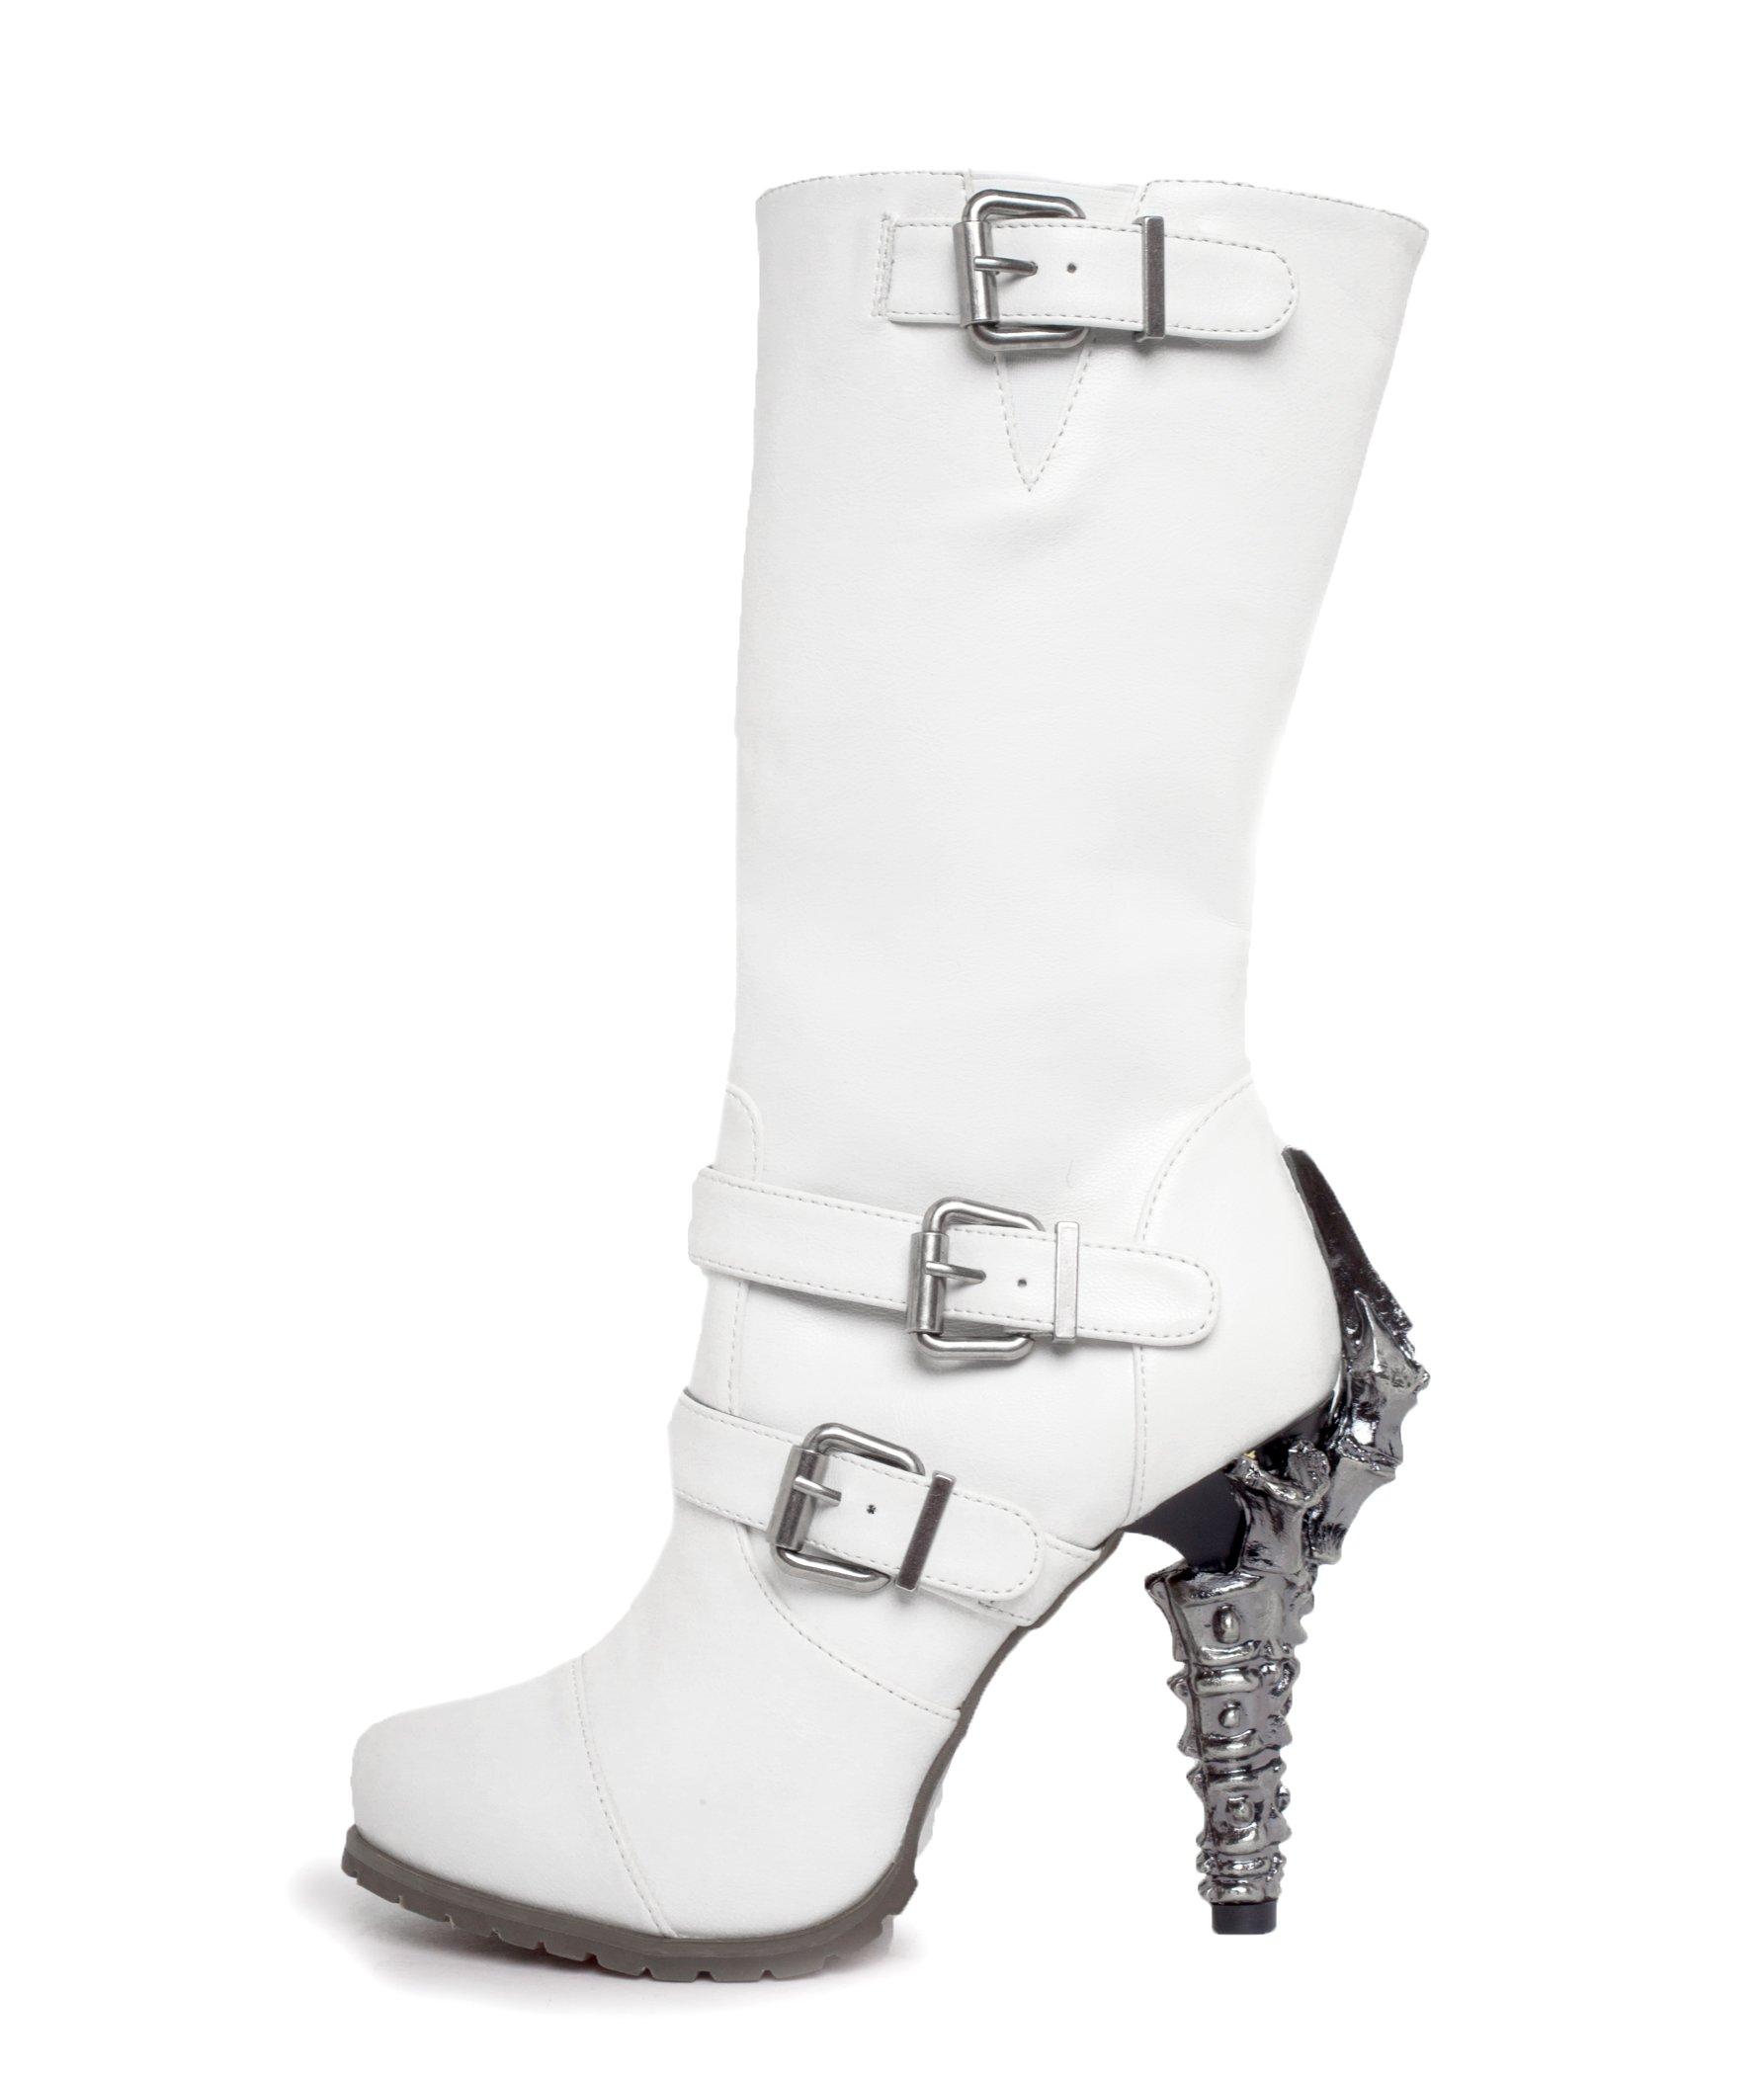 HADES Biker Knee High Boot Claw Heel Adjustable Ankle Top Strap Zip ARMA White-10